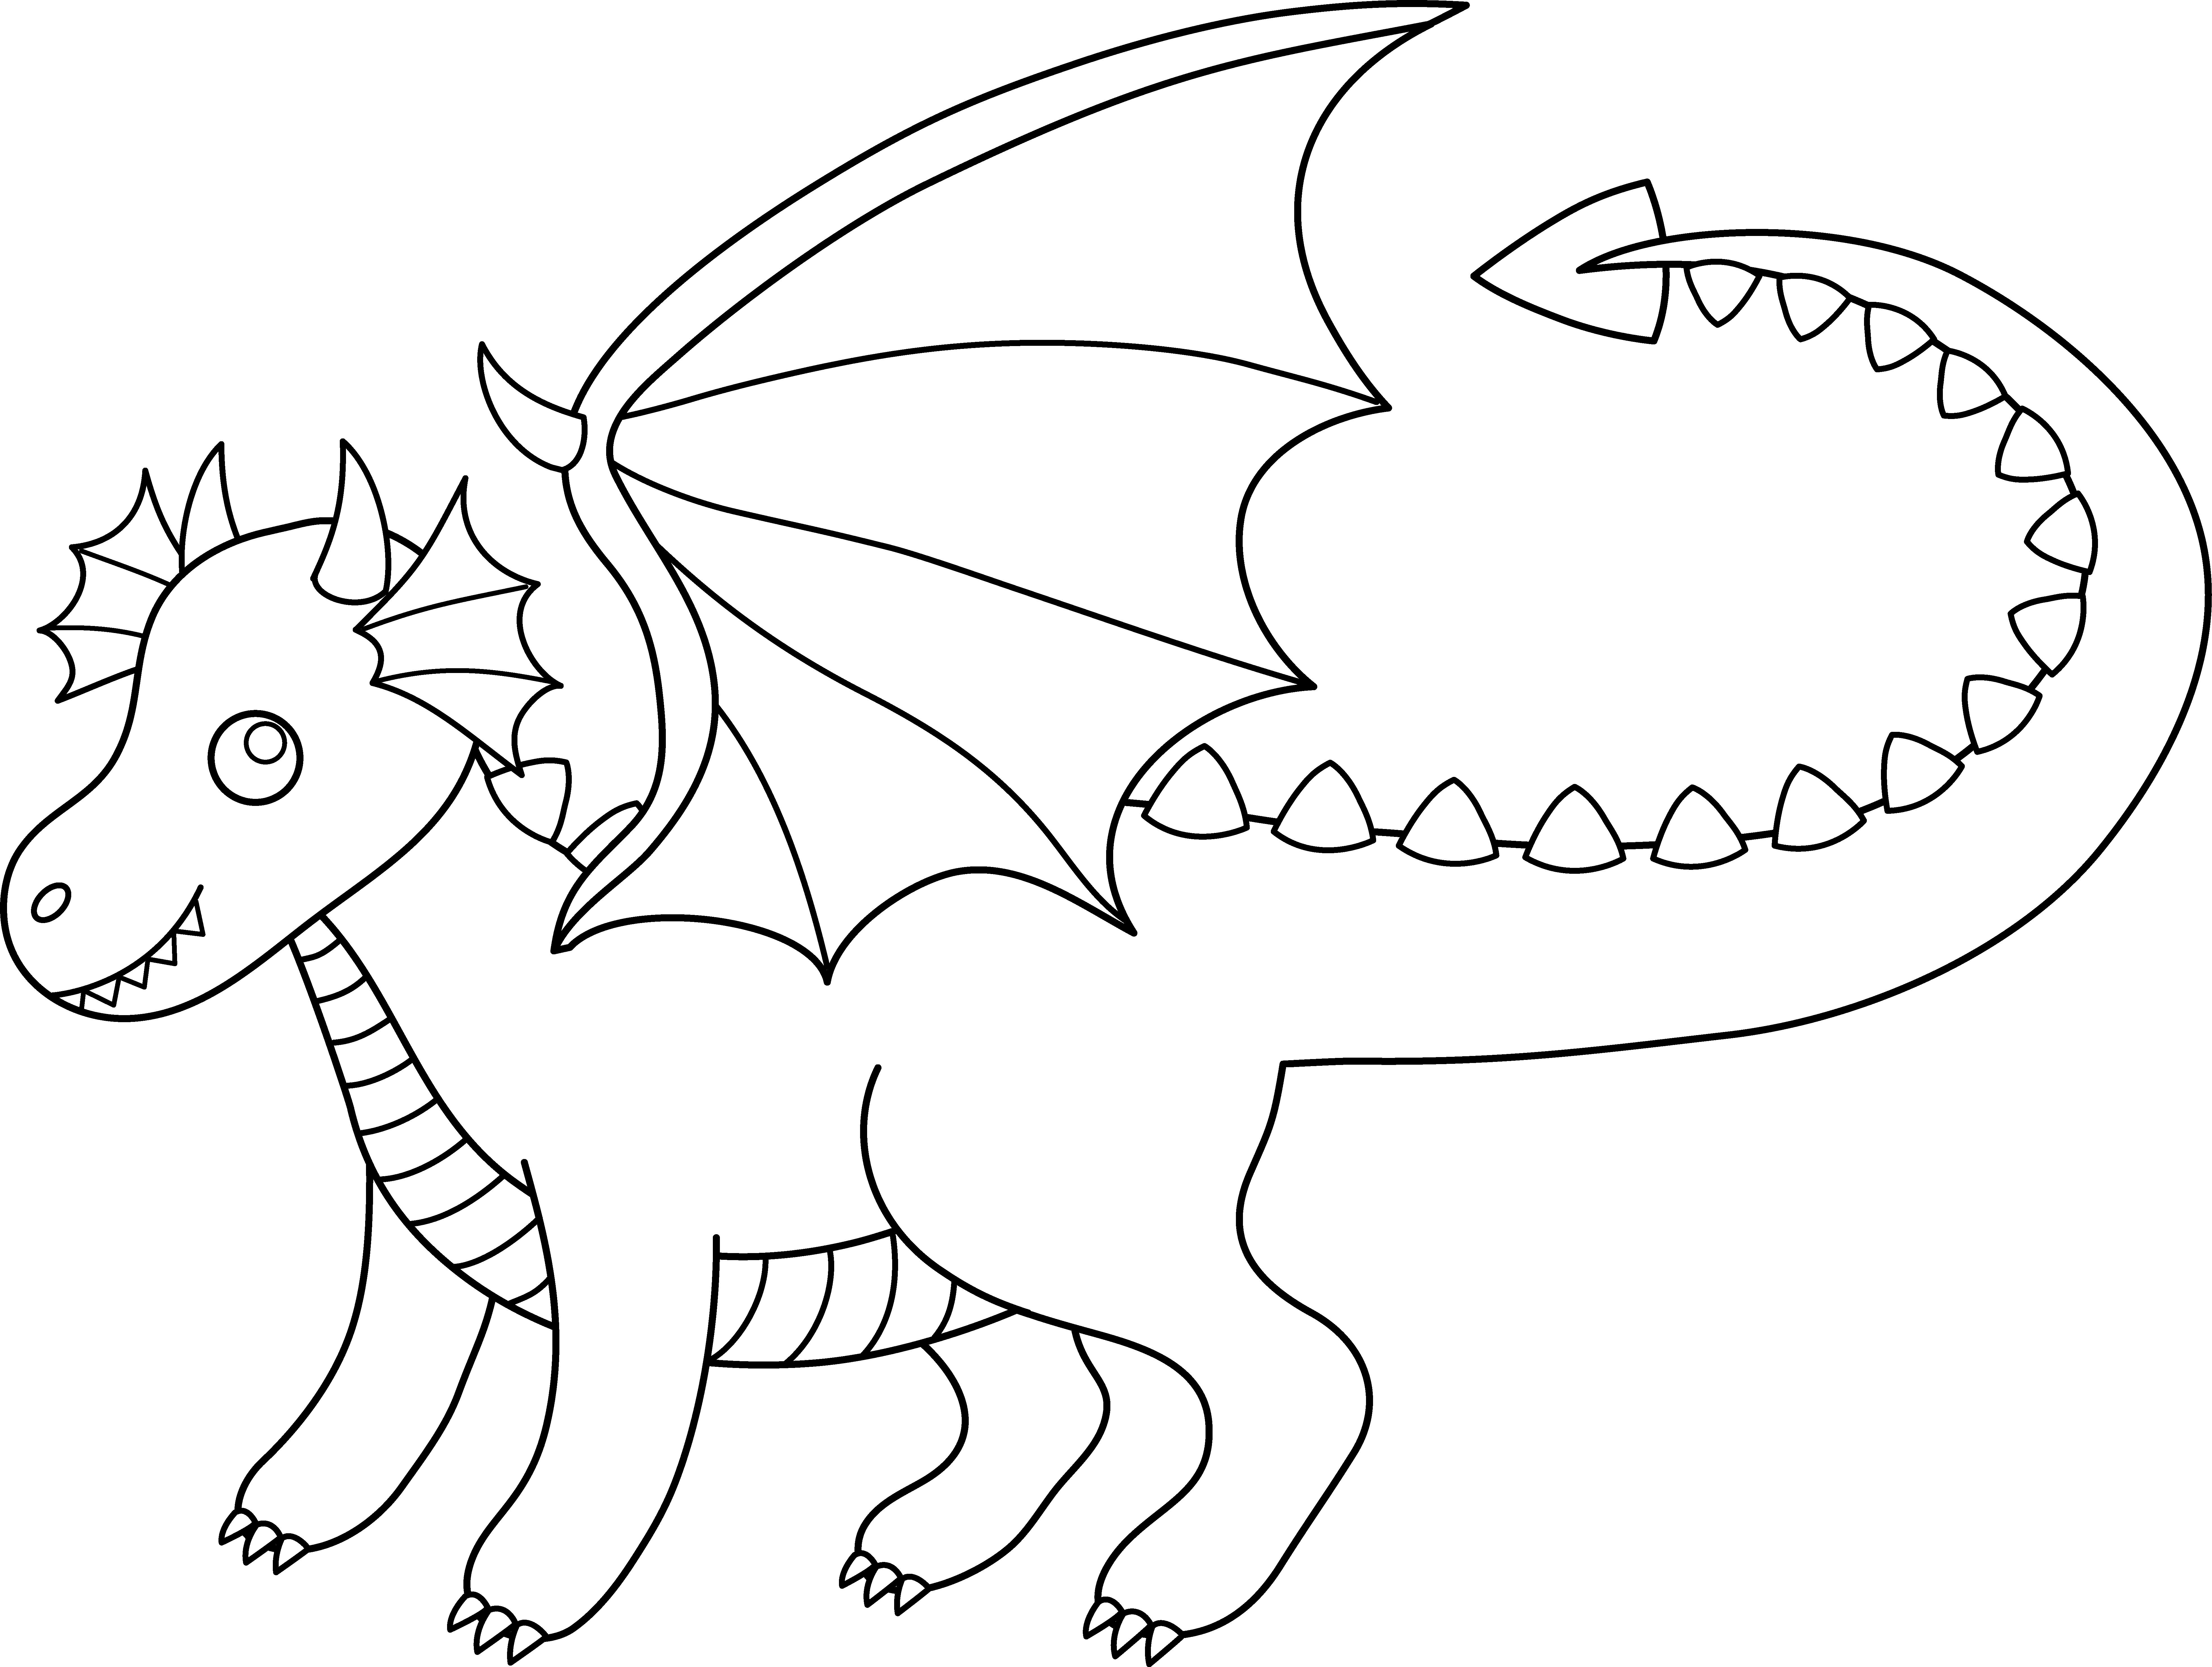 clip art coloring pages cute colorable dragon free clip art art clip coloring pages